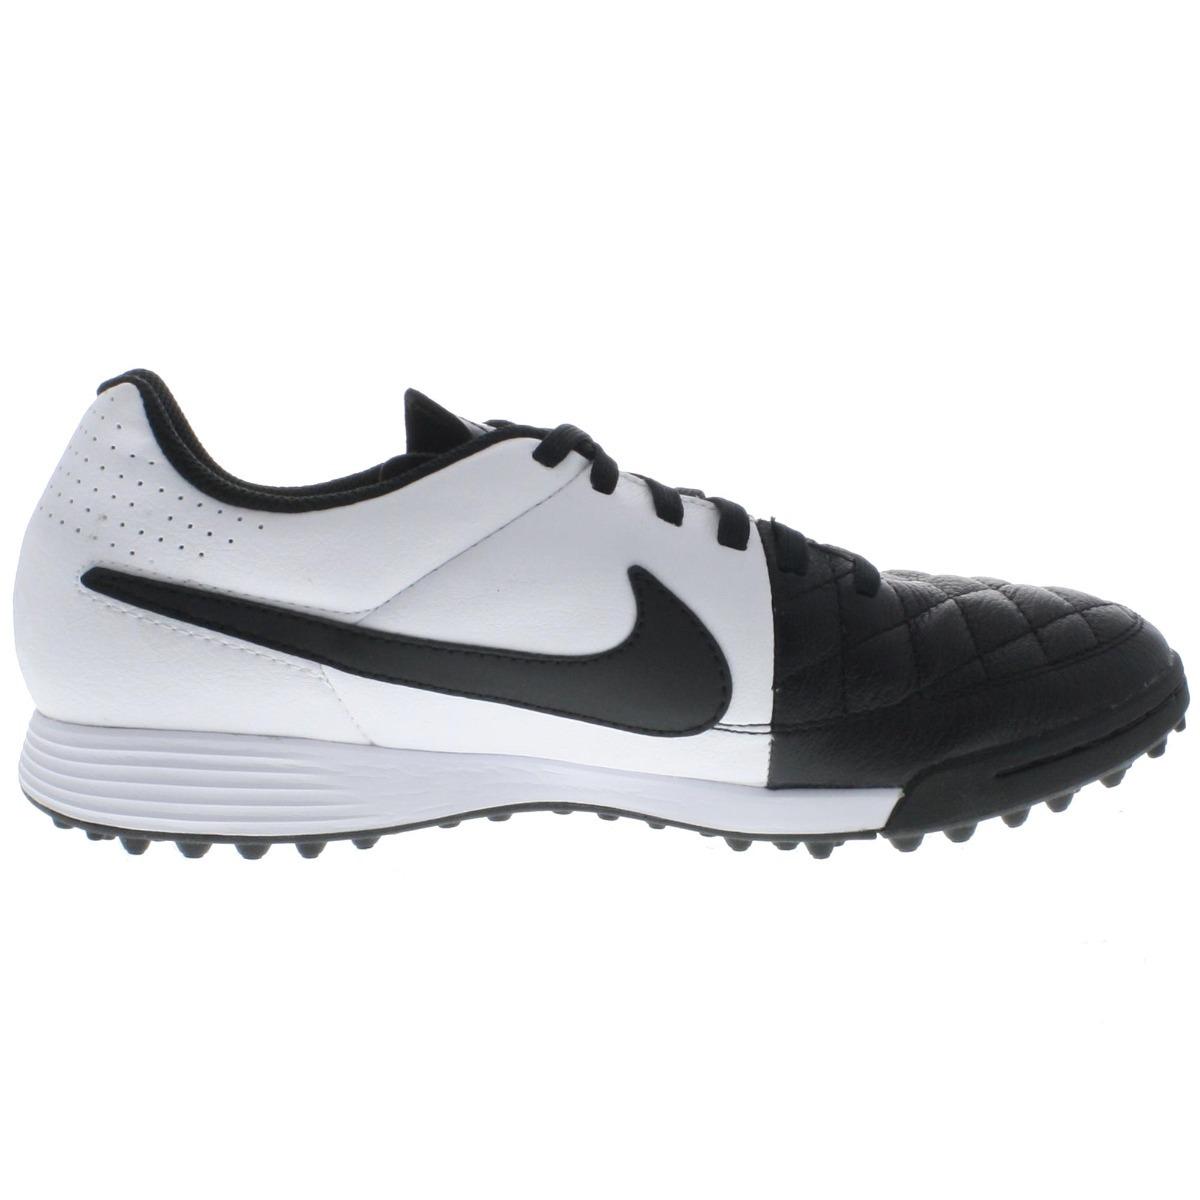 e8ff56d2bc Chuteira Nike Society Tiempo Genio Leather Tf 2bros - R$ 269,90 em ...